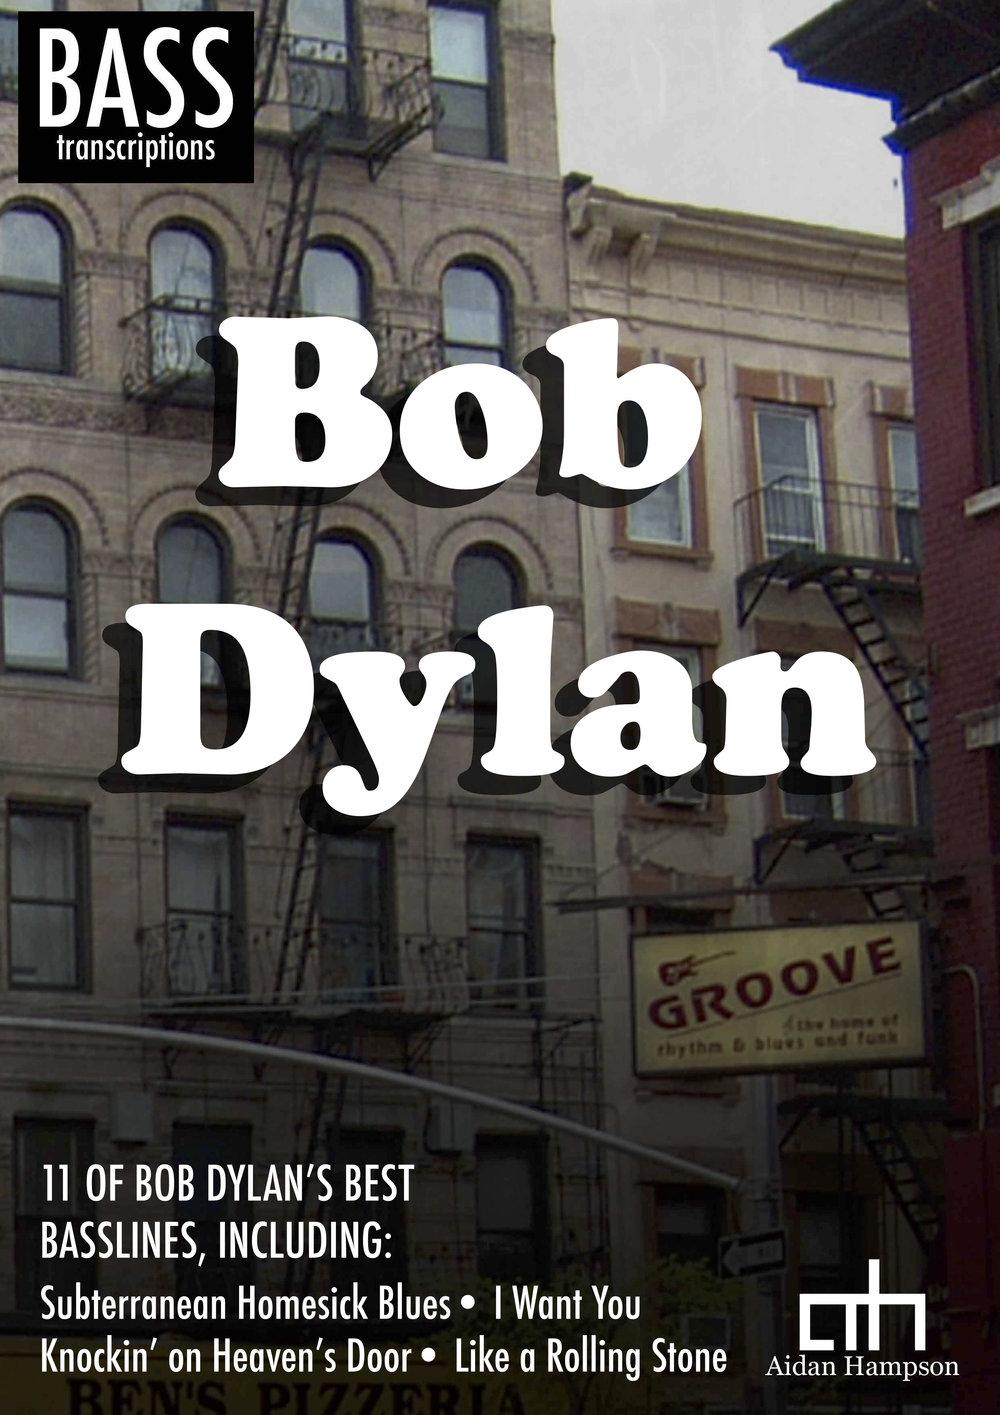 Bob Dylan - Bass.jpg